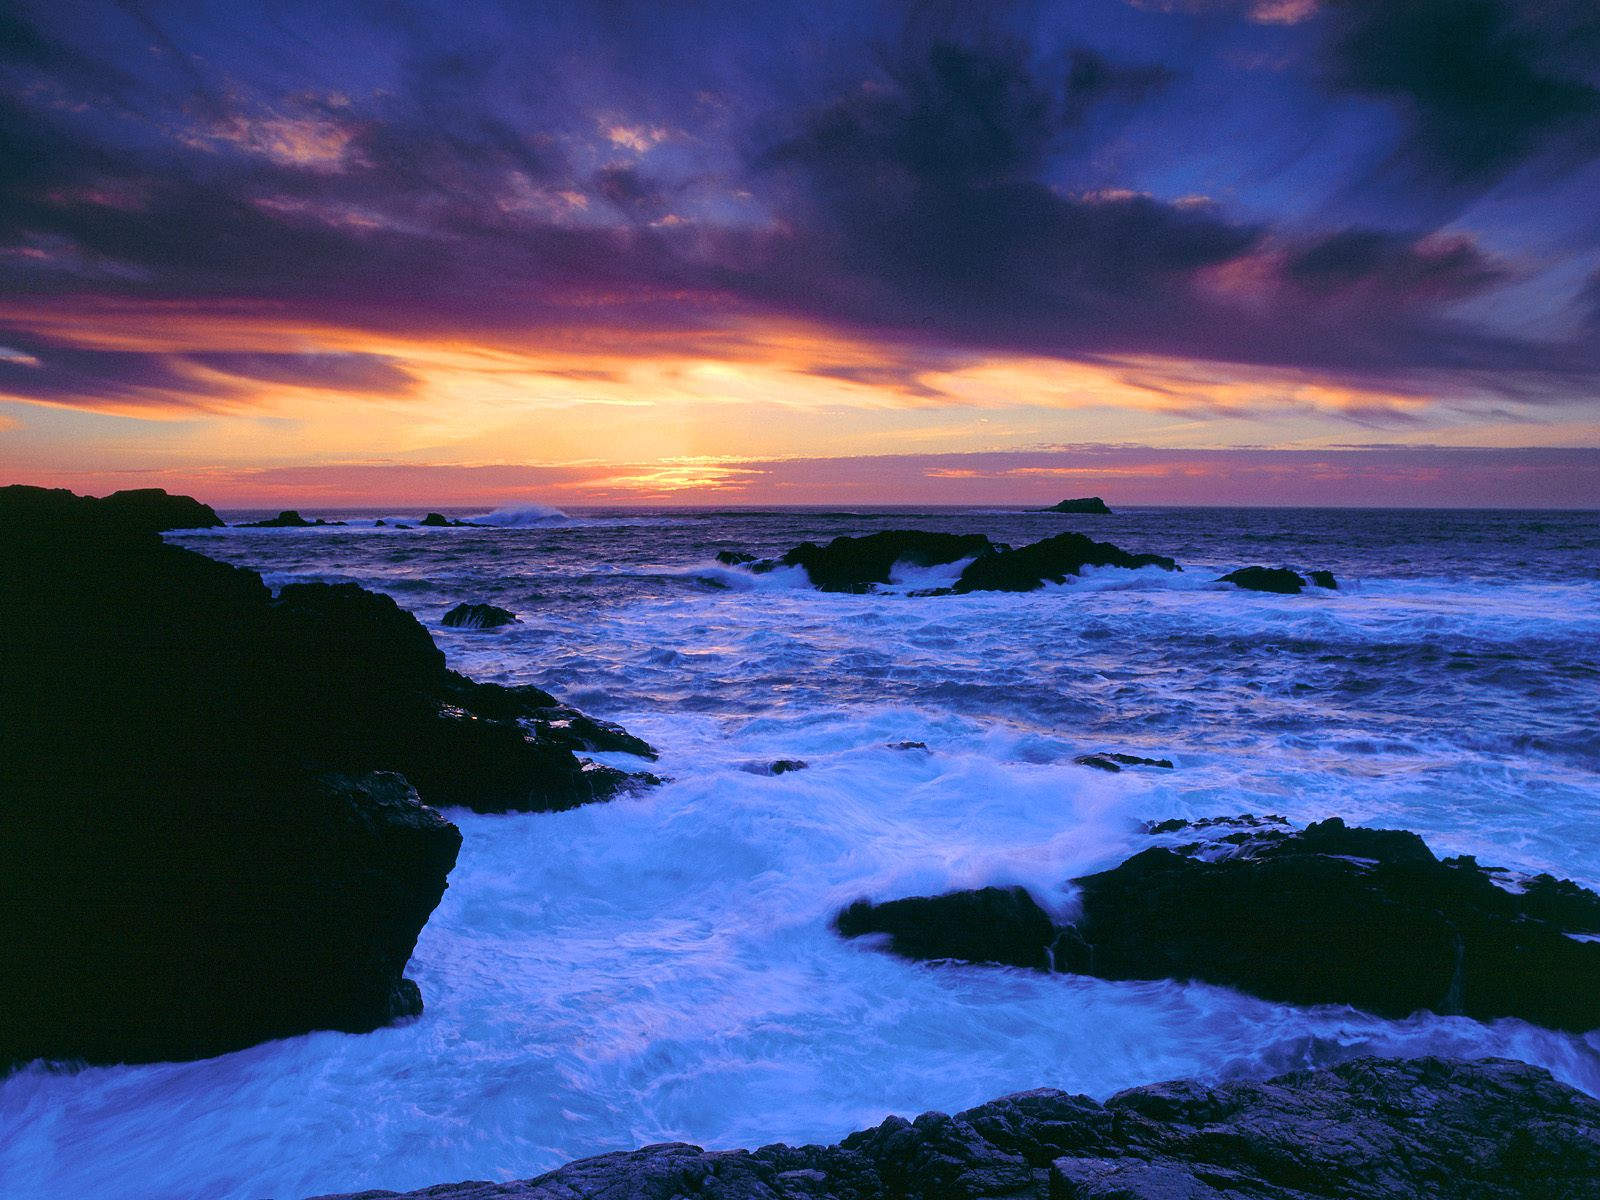 carmel coast california wallpaper you are viewing the nature wallpaper 1600x1200